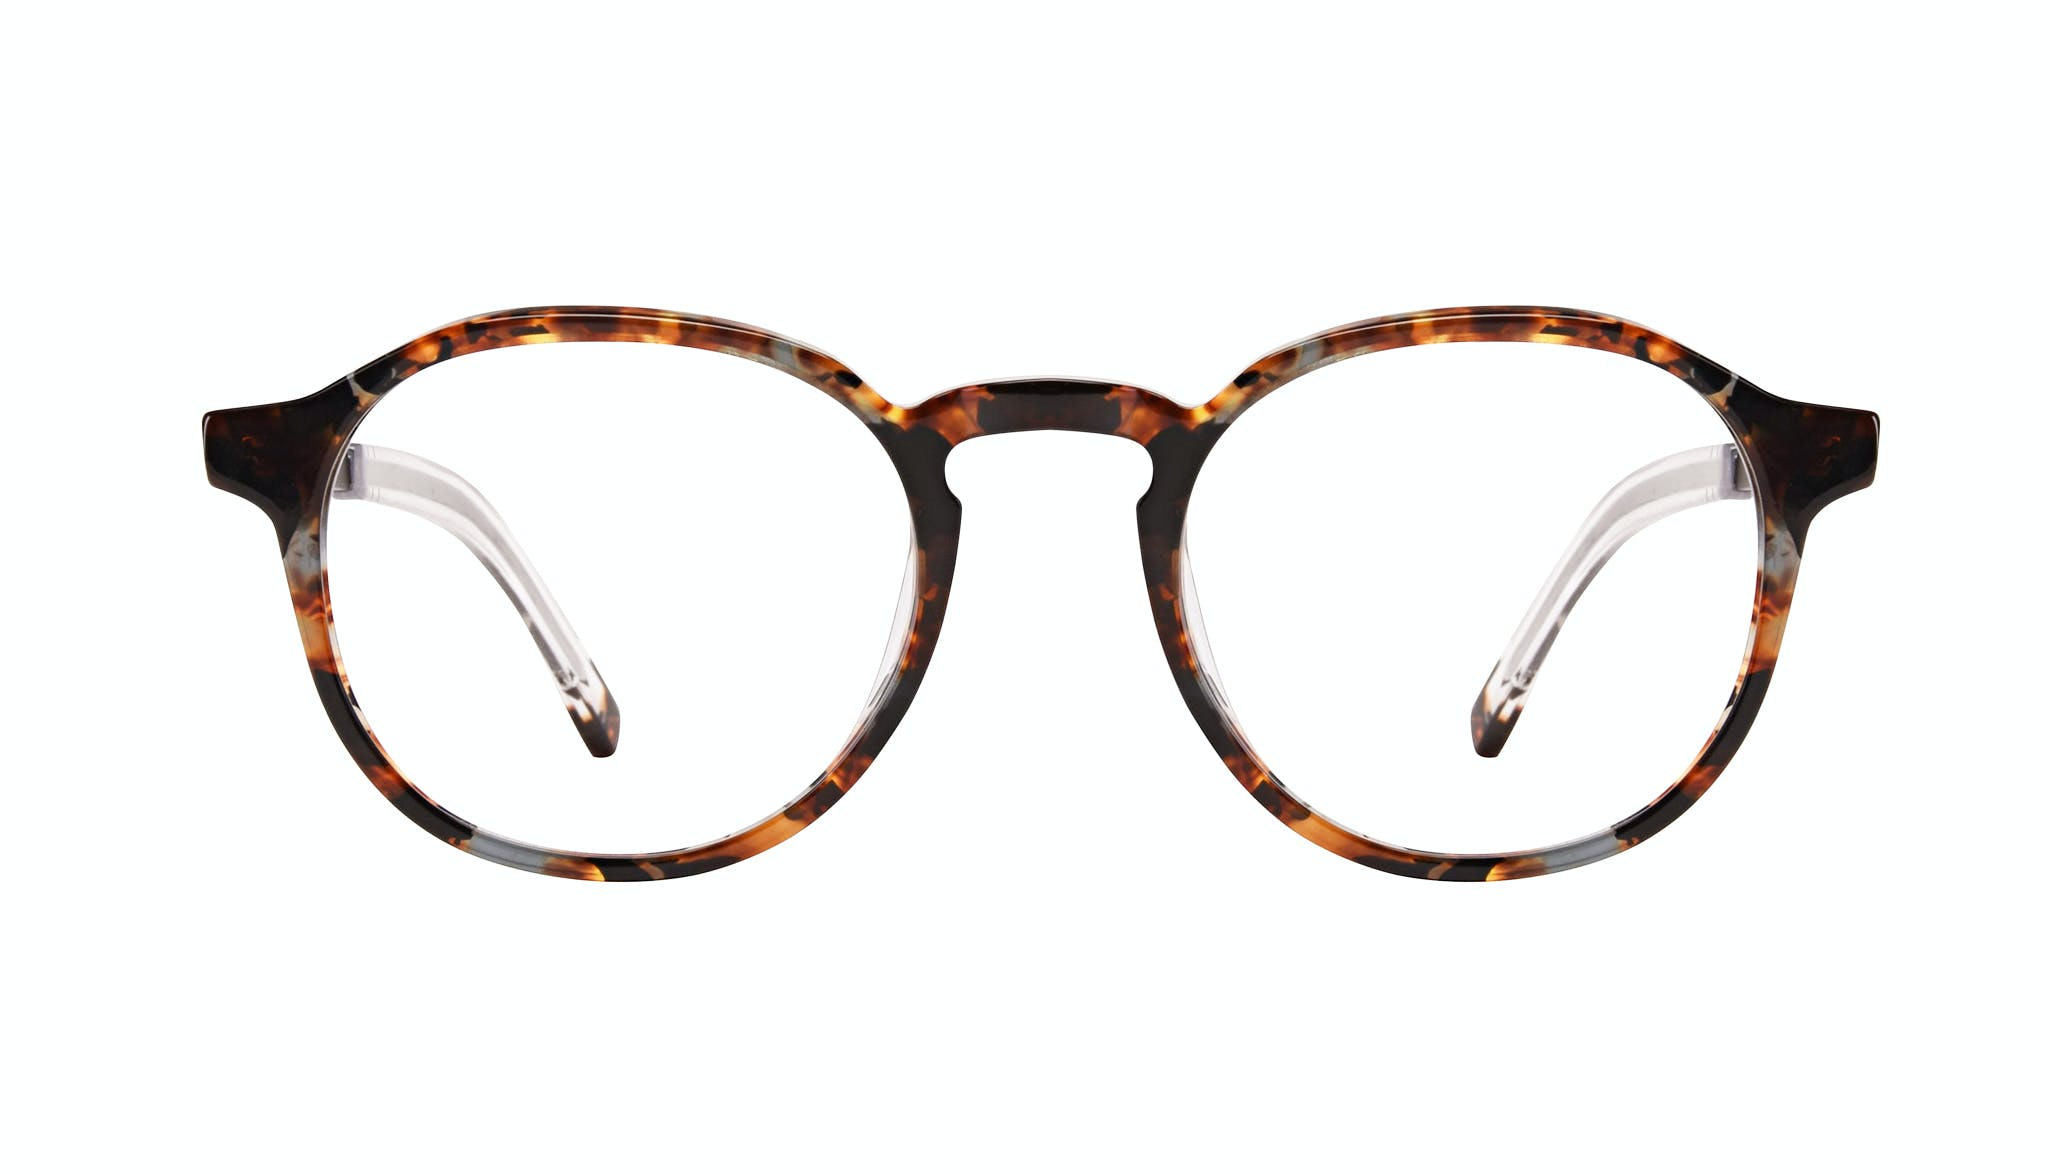 Affordable Fashion Glasses Round Eyeglasses Men Prime XL Mahogany Front